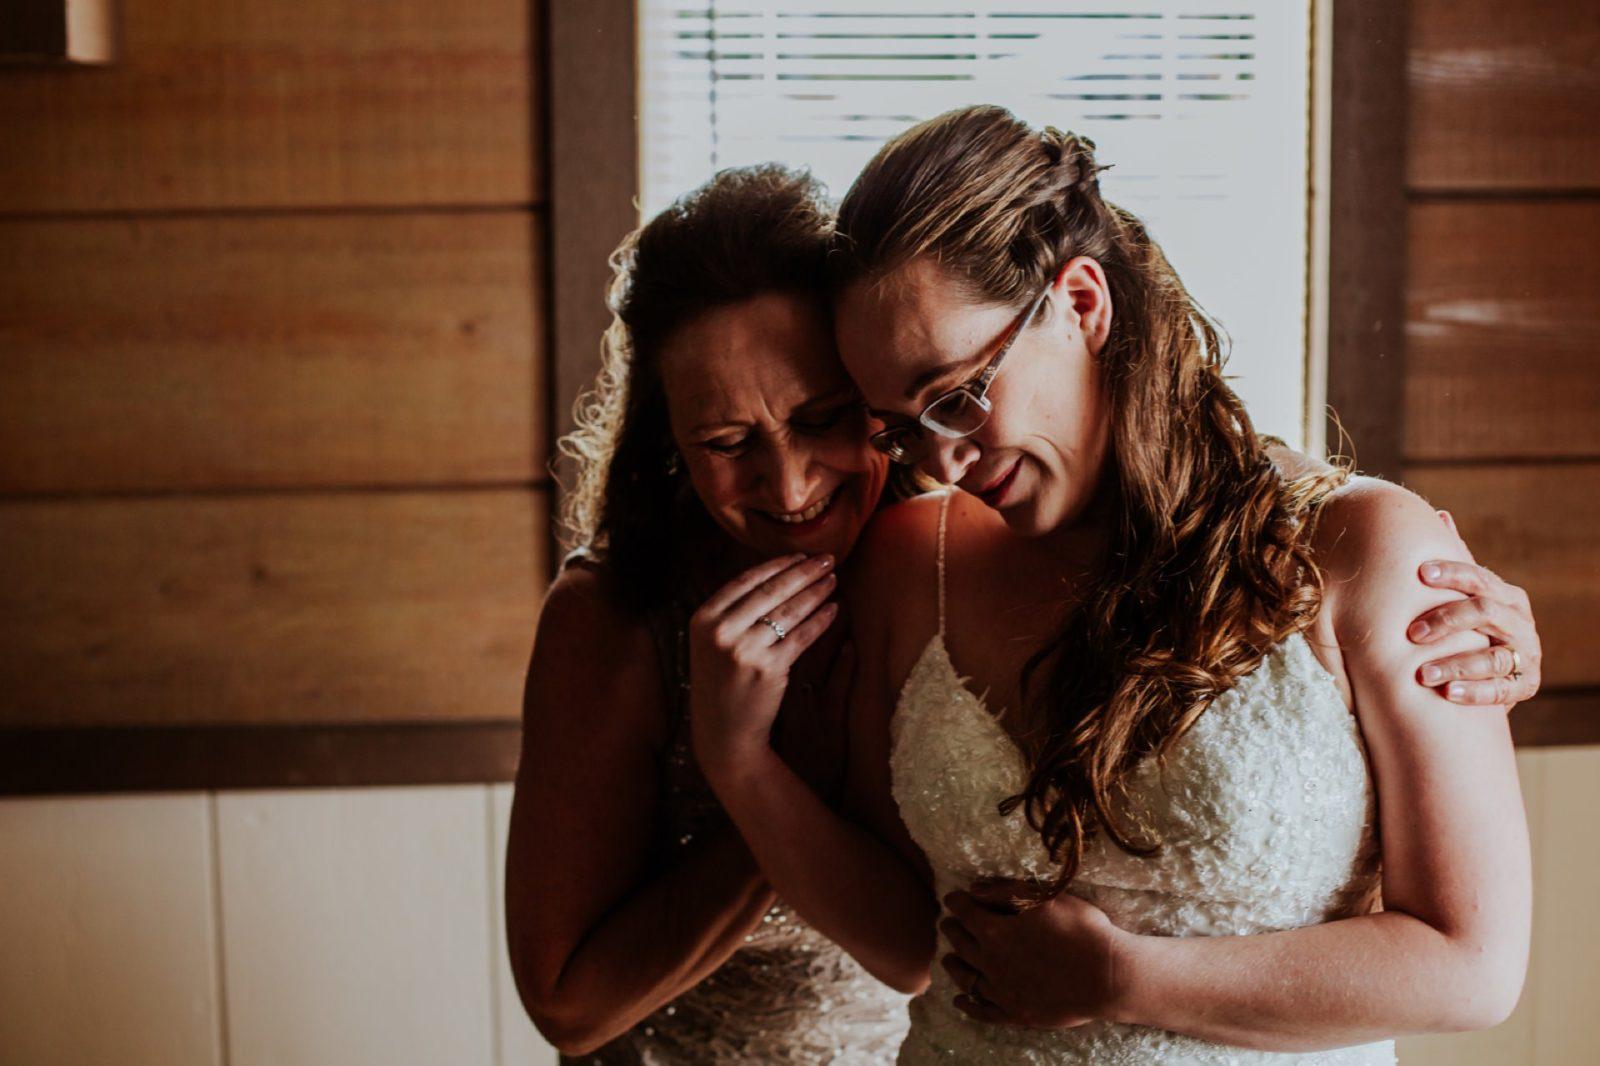 charming-willows-wedding_016-1600x1066.jpg